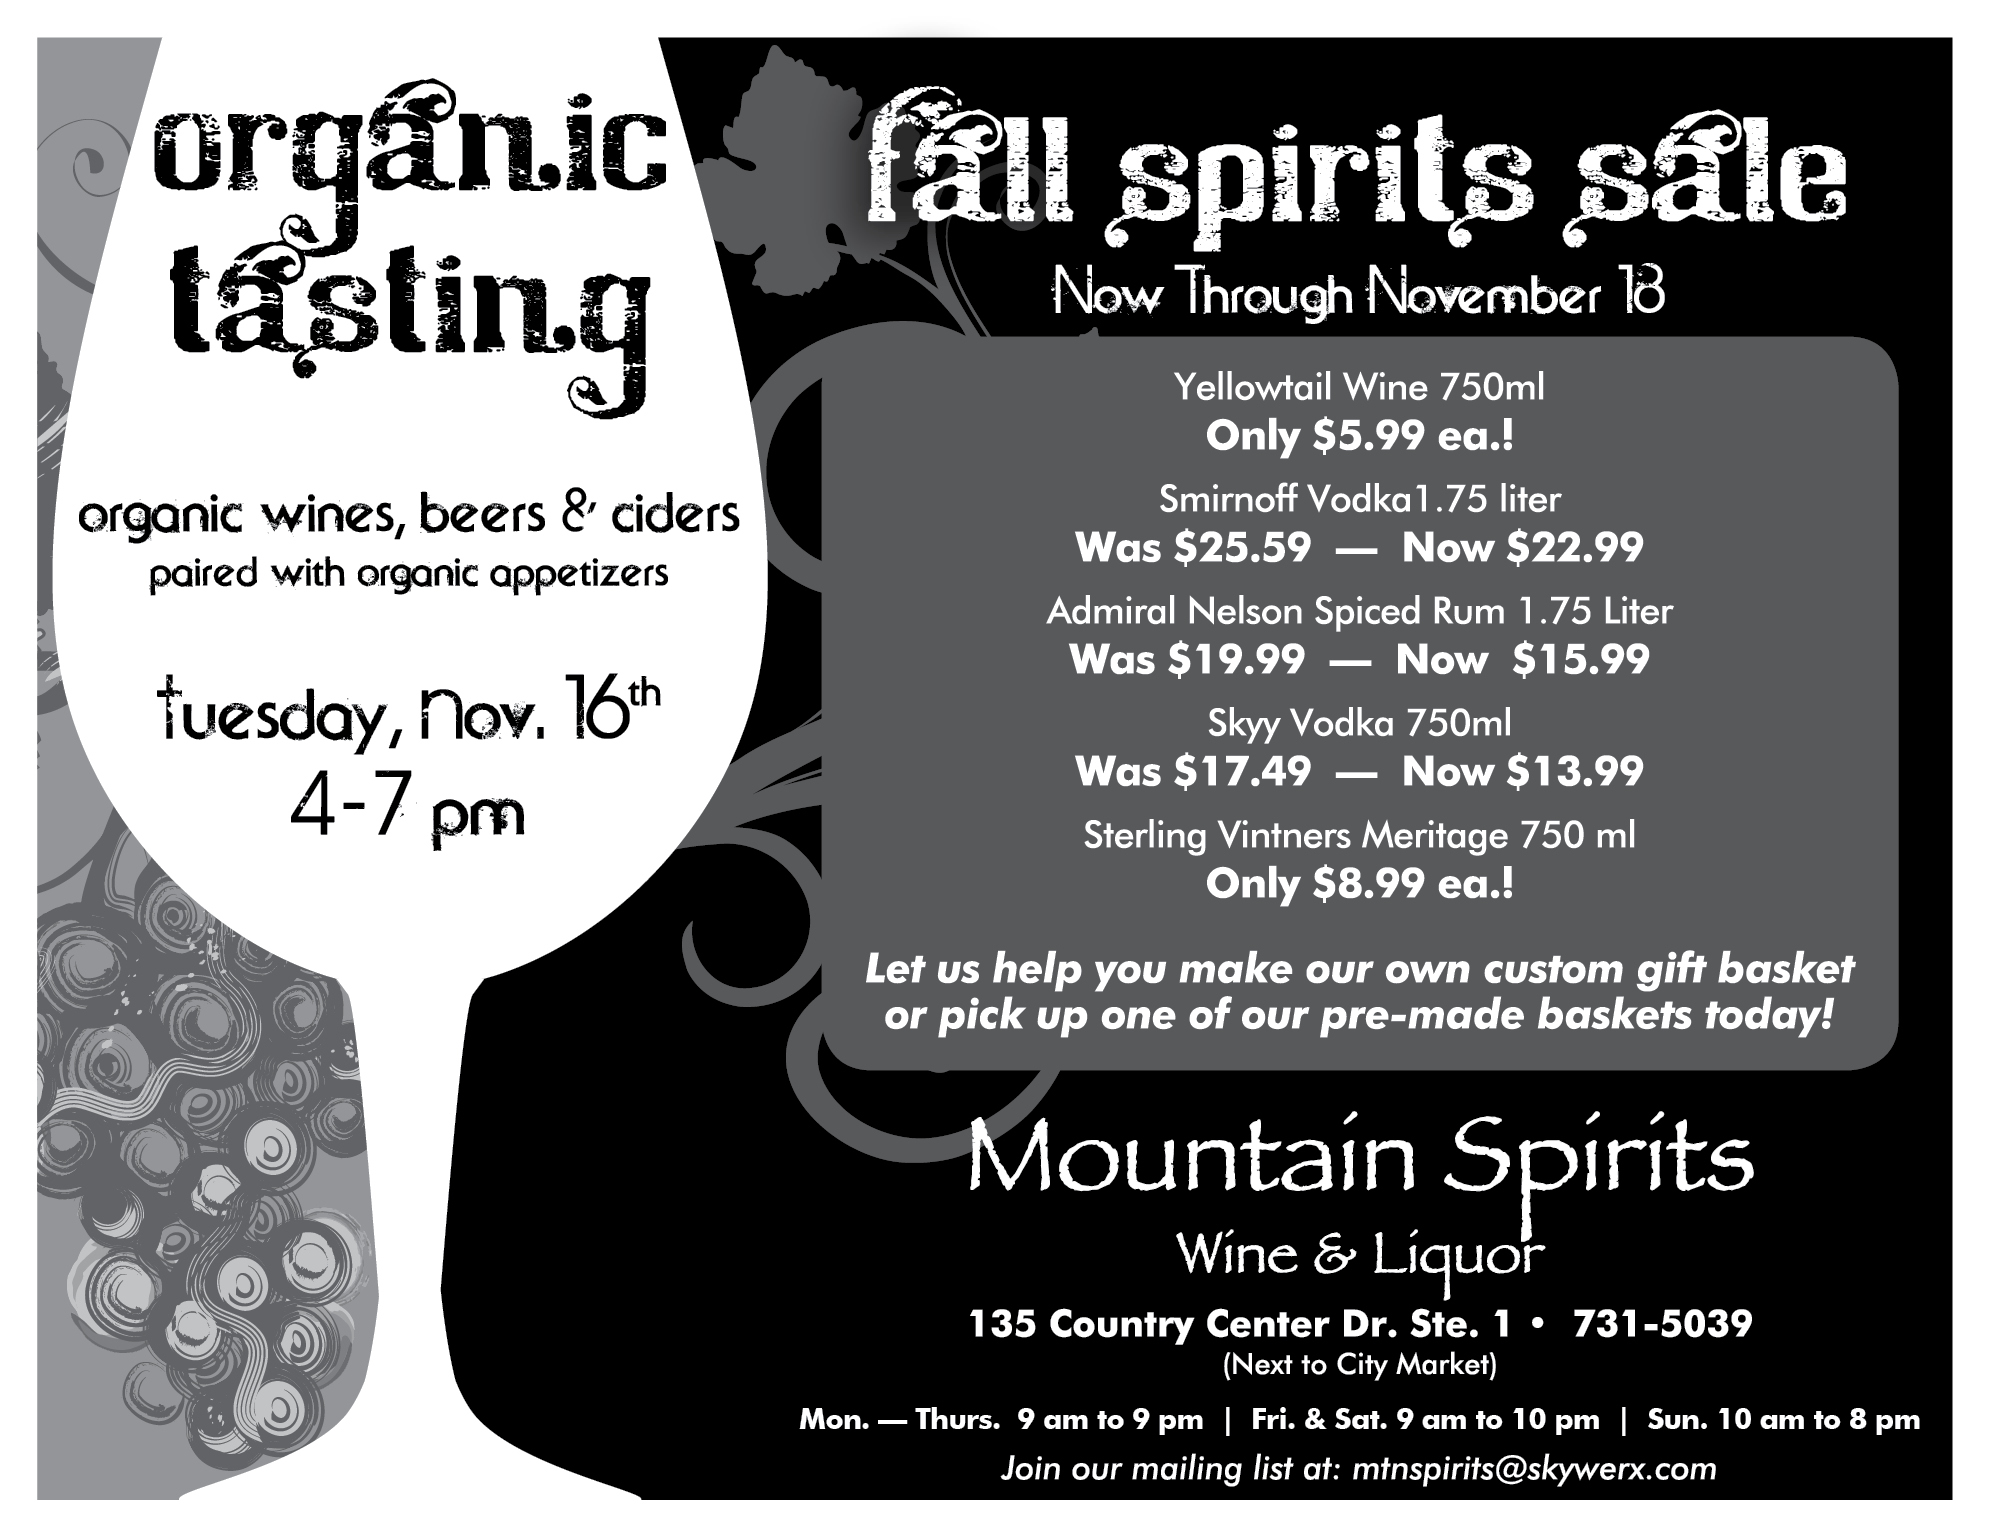 mtn spirits organic tasting.jpg